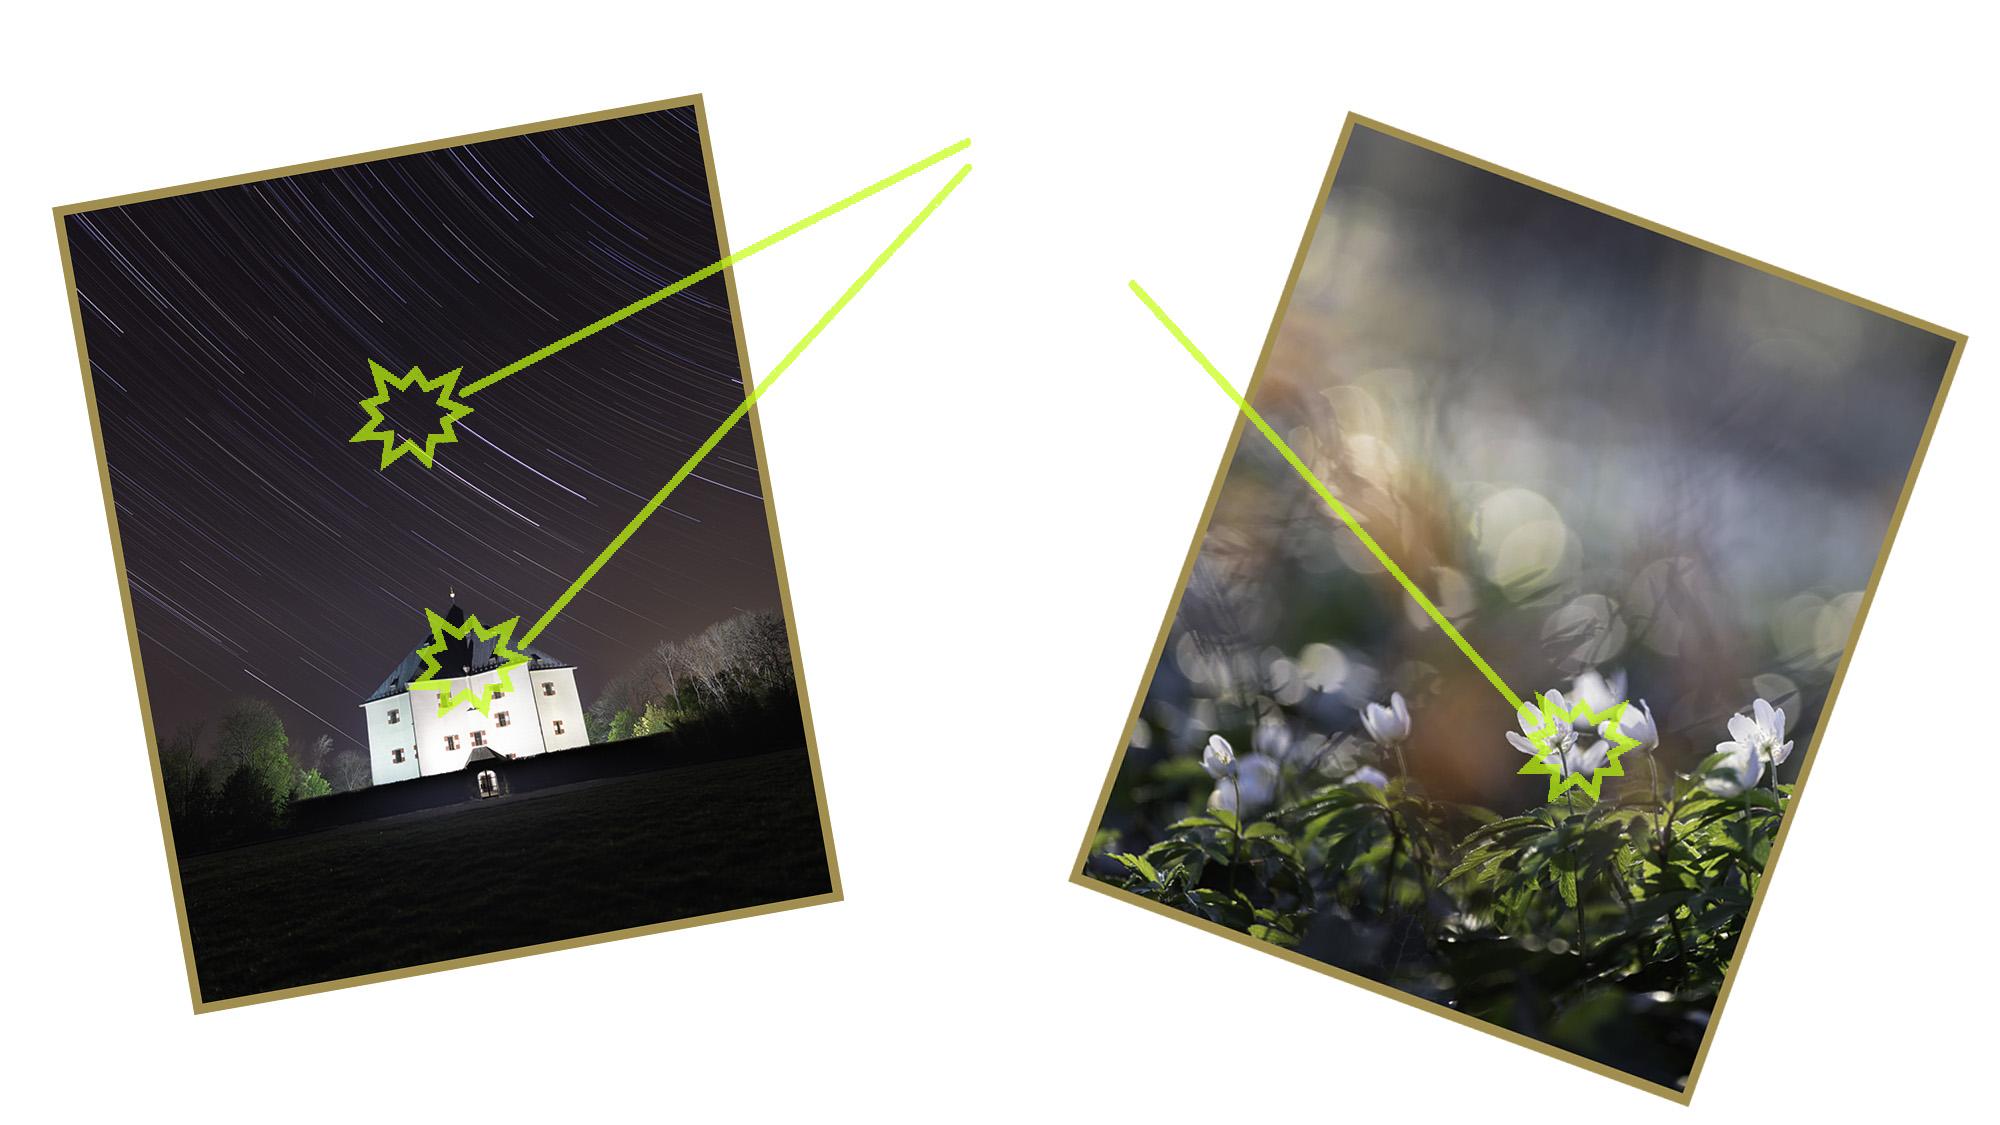 9 Amazing Tips for Sharper Landscape Photos